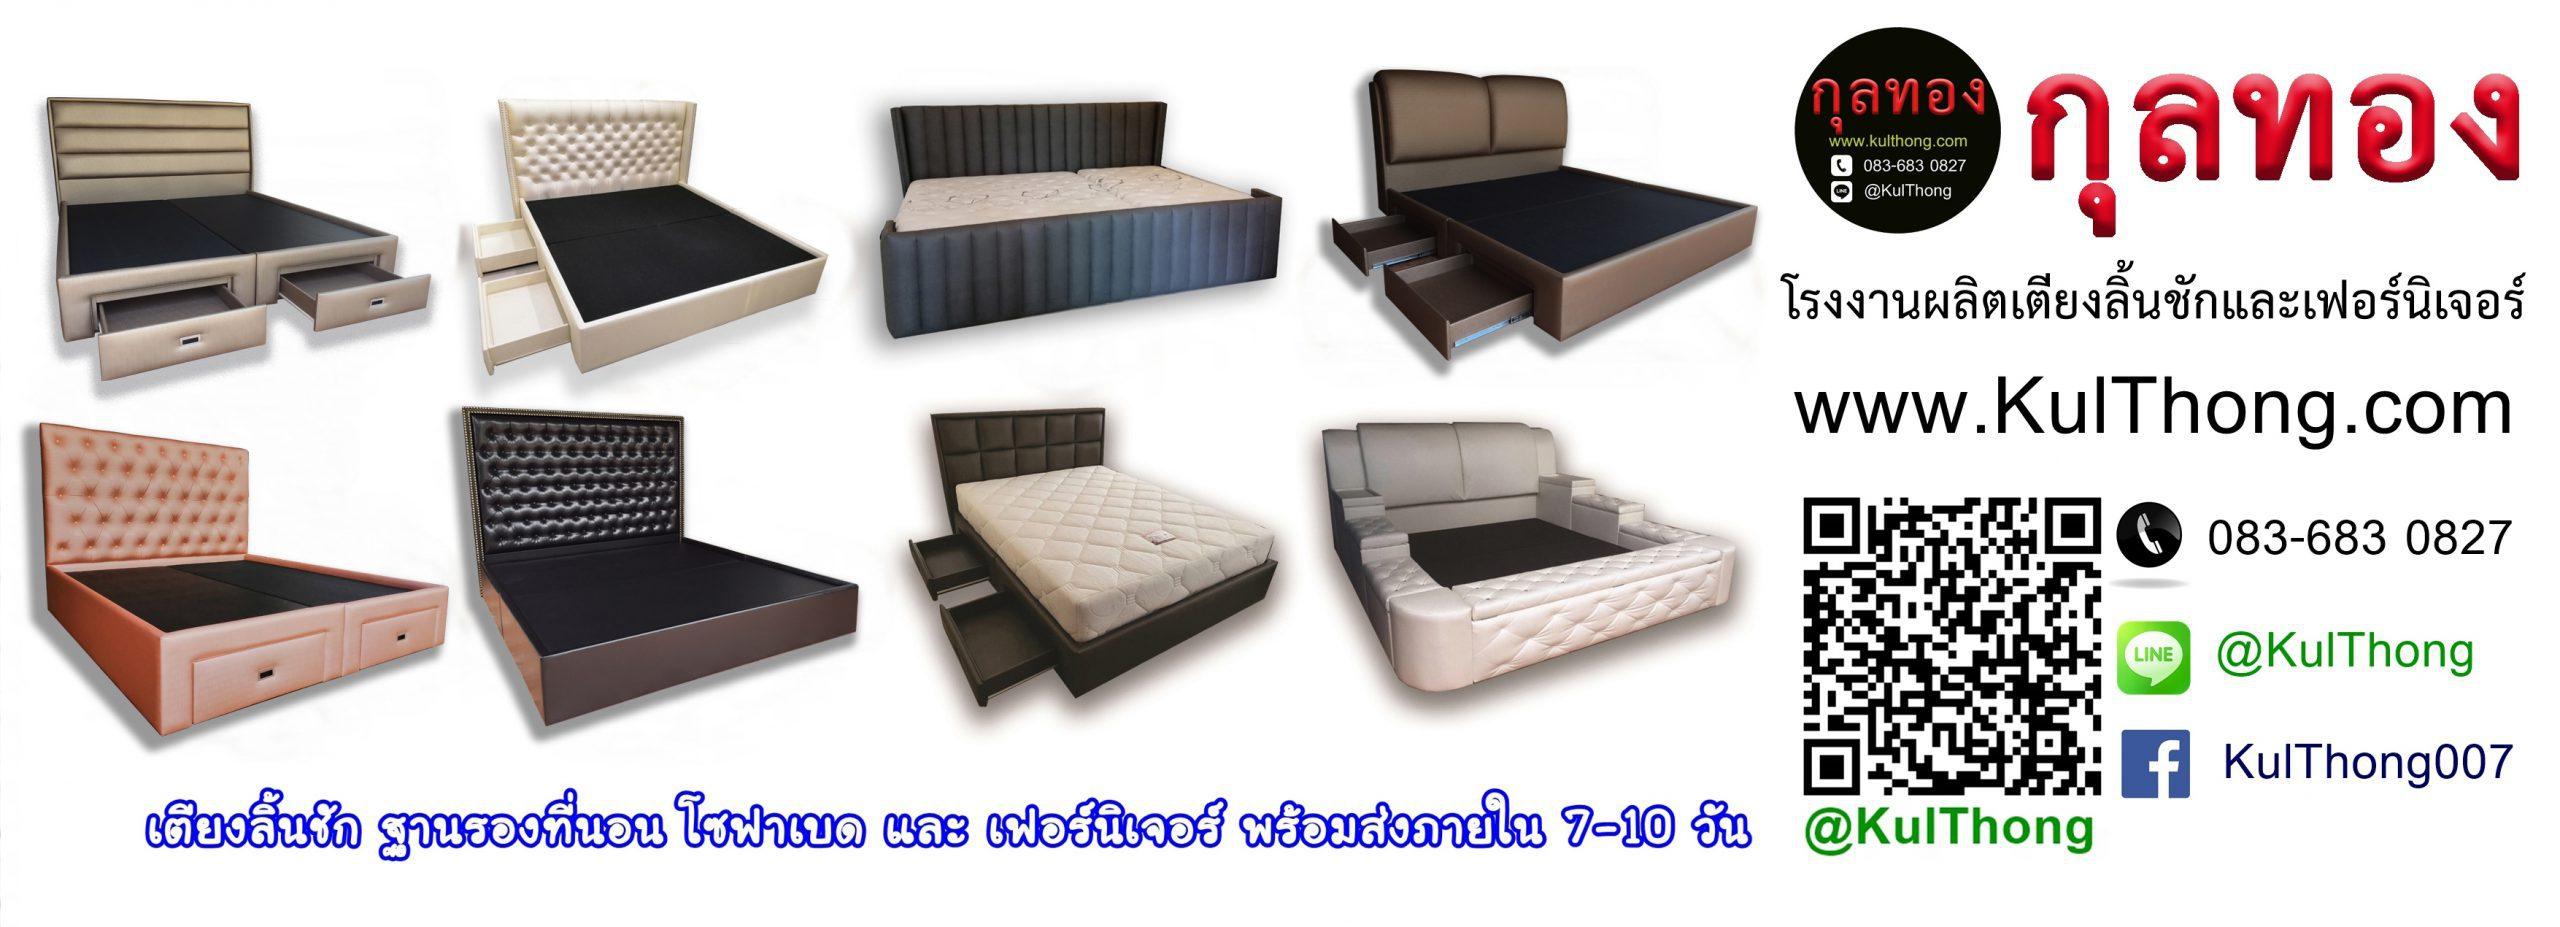 KulThong Bedding And Furniture